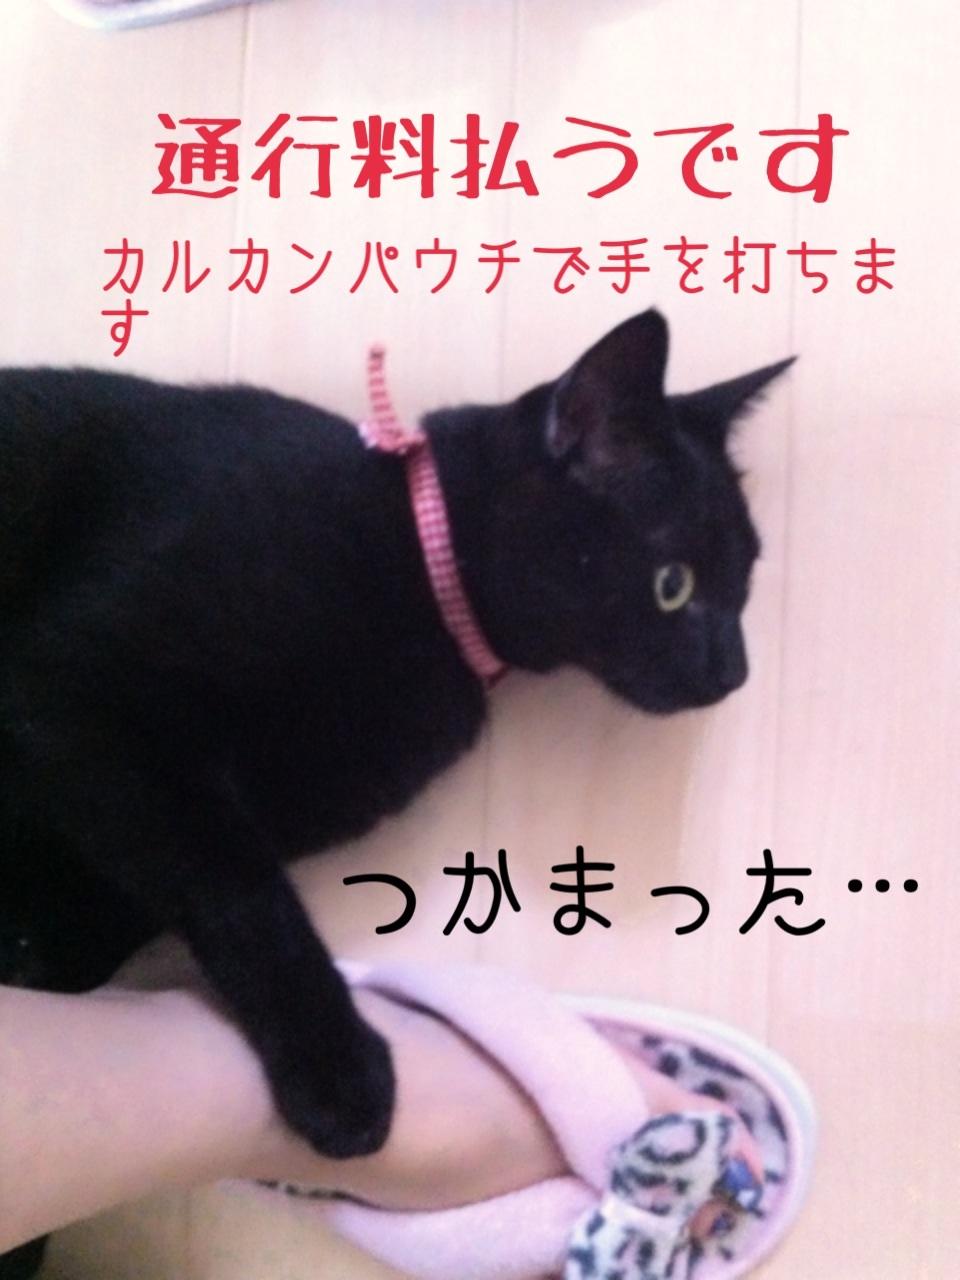 image_201308022348363f0.jpg